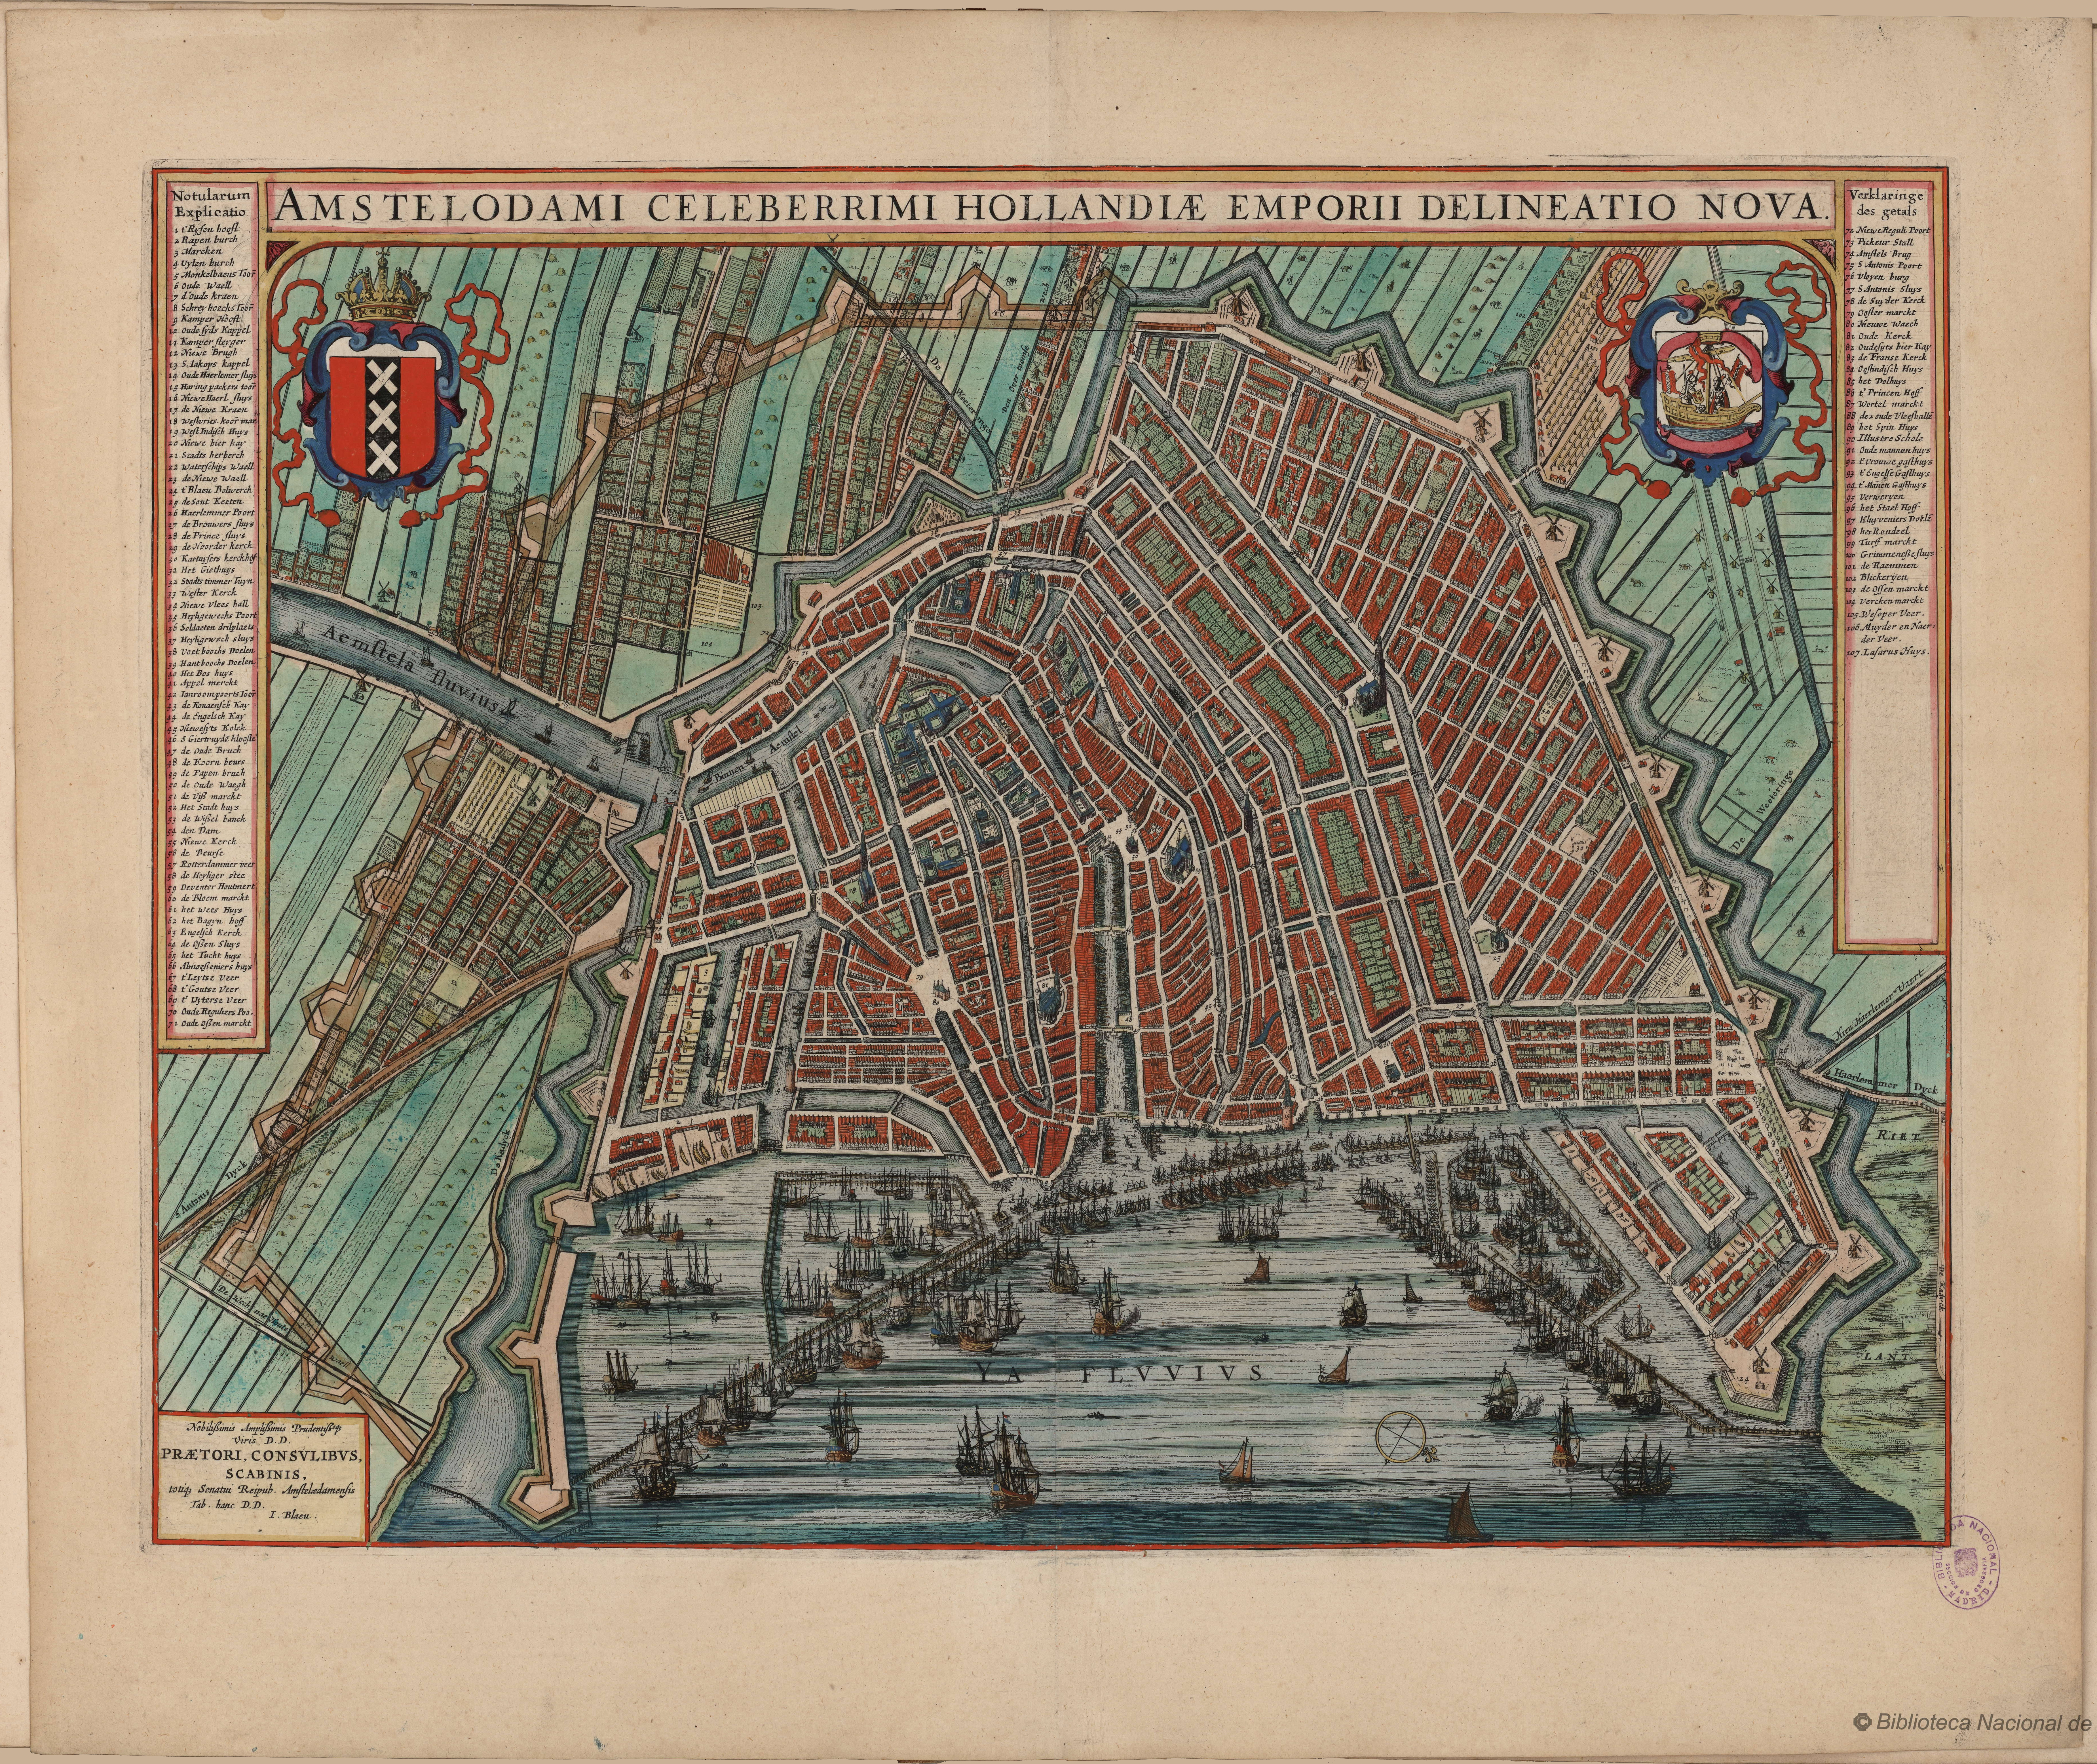 Map_of_Amsterdam_-_Amstelodami_Celeberrimi_Hollandiae_Emporii_Delineatio_Nova_(J.Blaeu,_1649).jpg